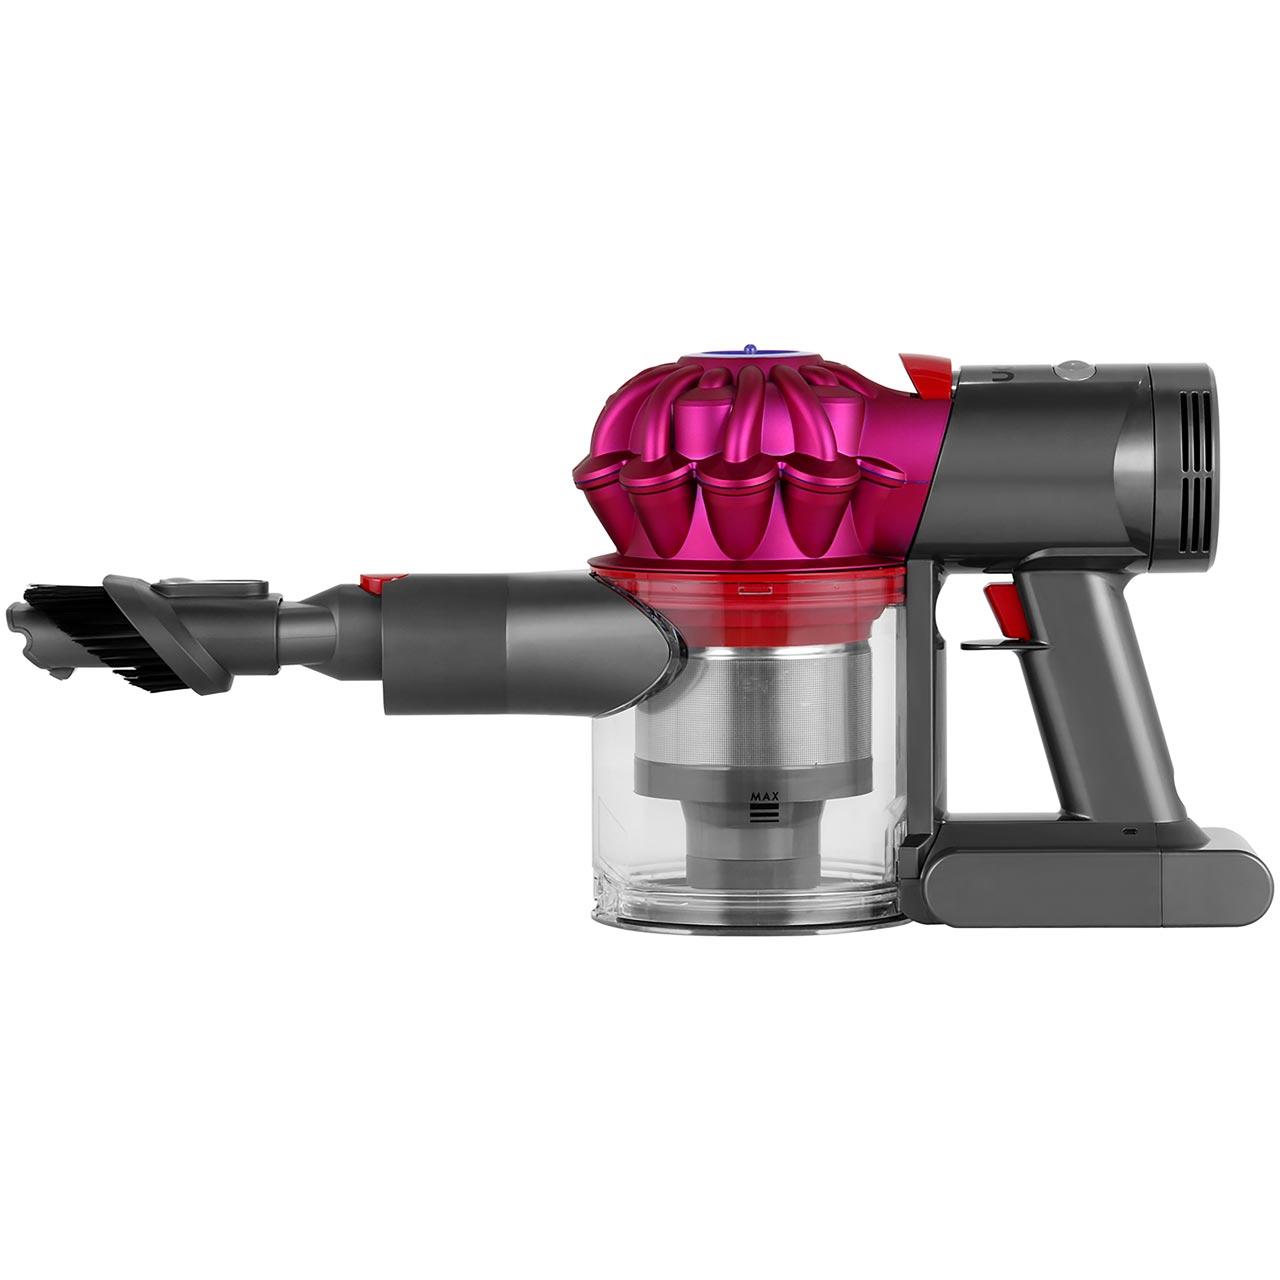 Dyson V7 Motorhead Cordless Vacuum Cleaner 2 Year